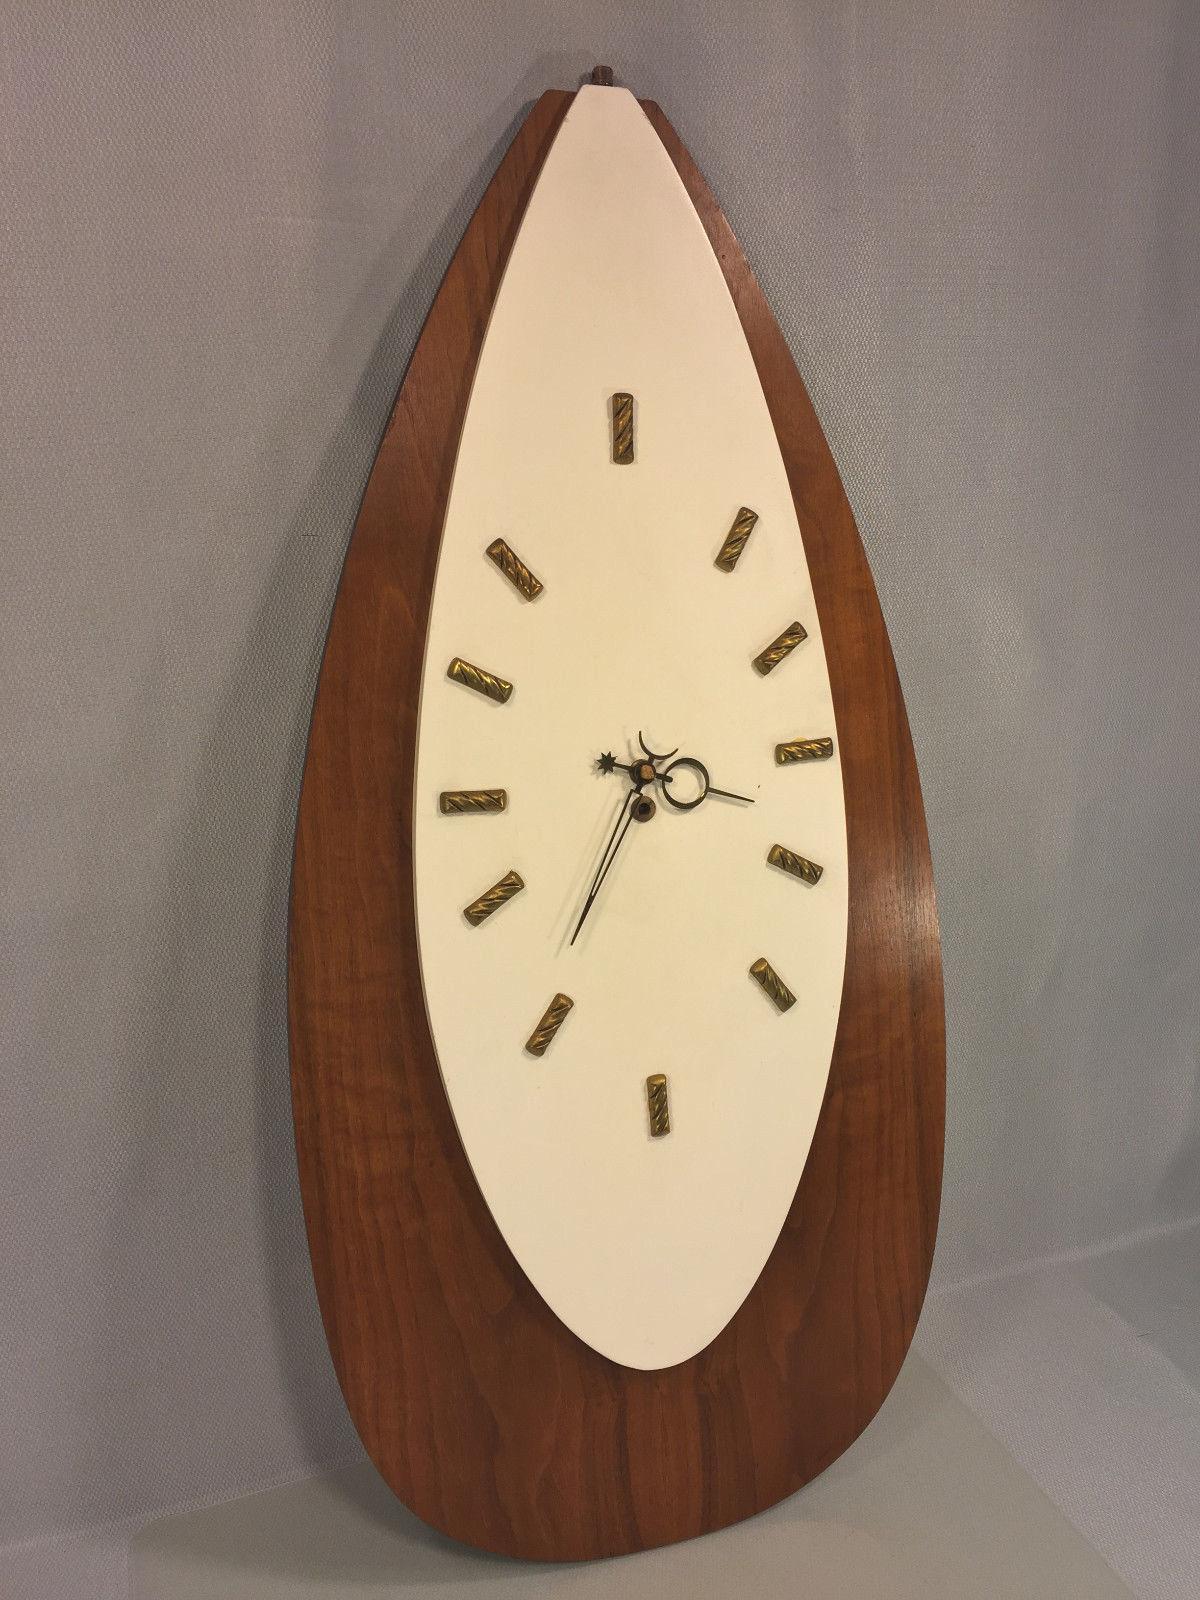 Vintage Modern Art Deco Duverdrey Amp Bloquel Wall Clock